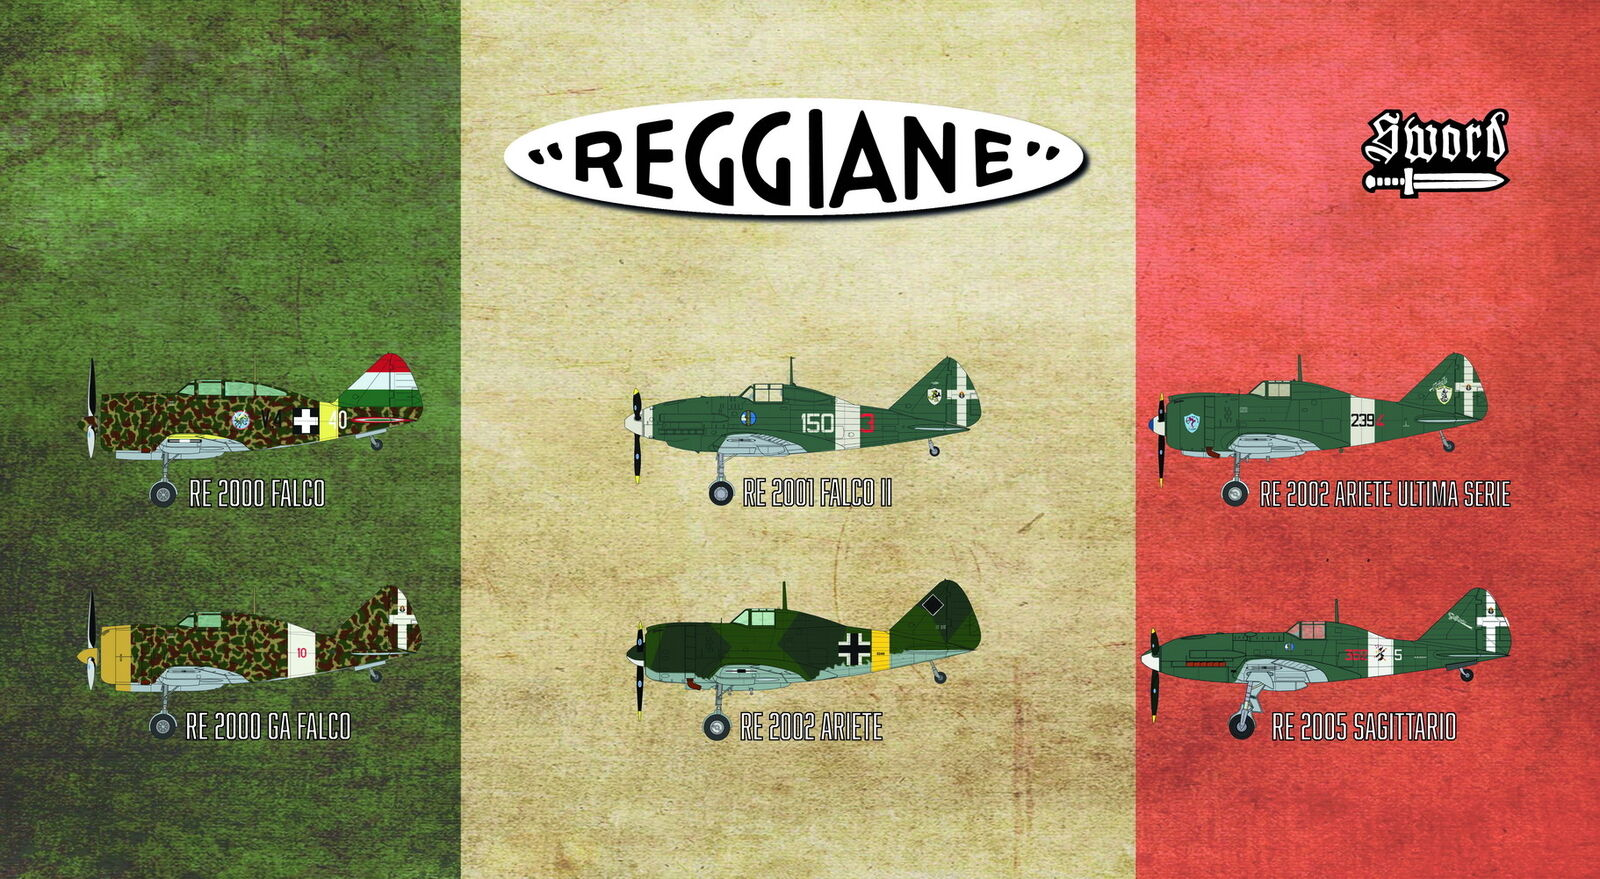 Sword 1 72 Reggiane Fighters  72110  | Vogue